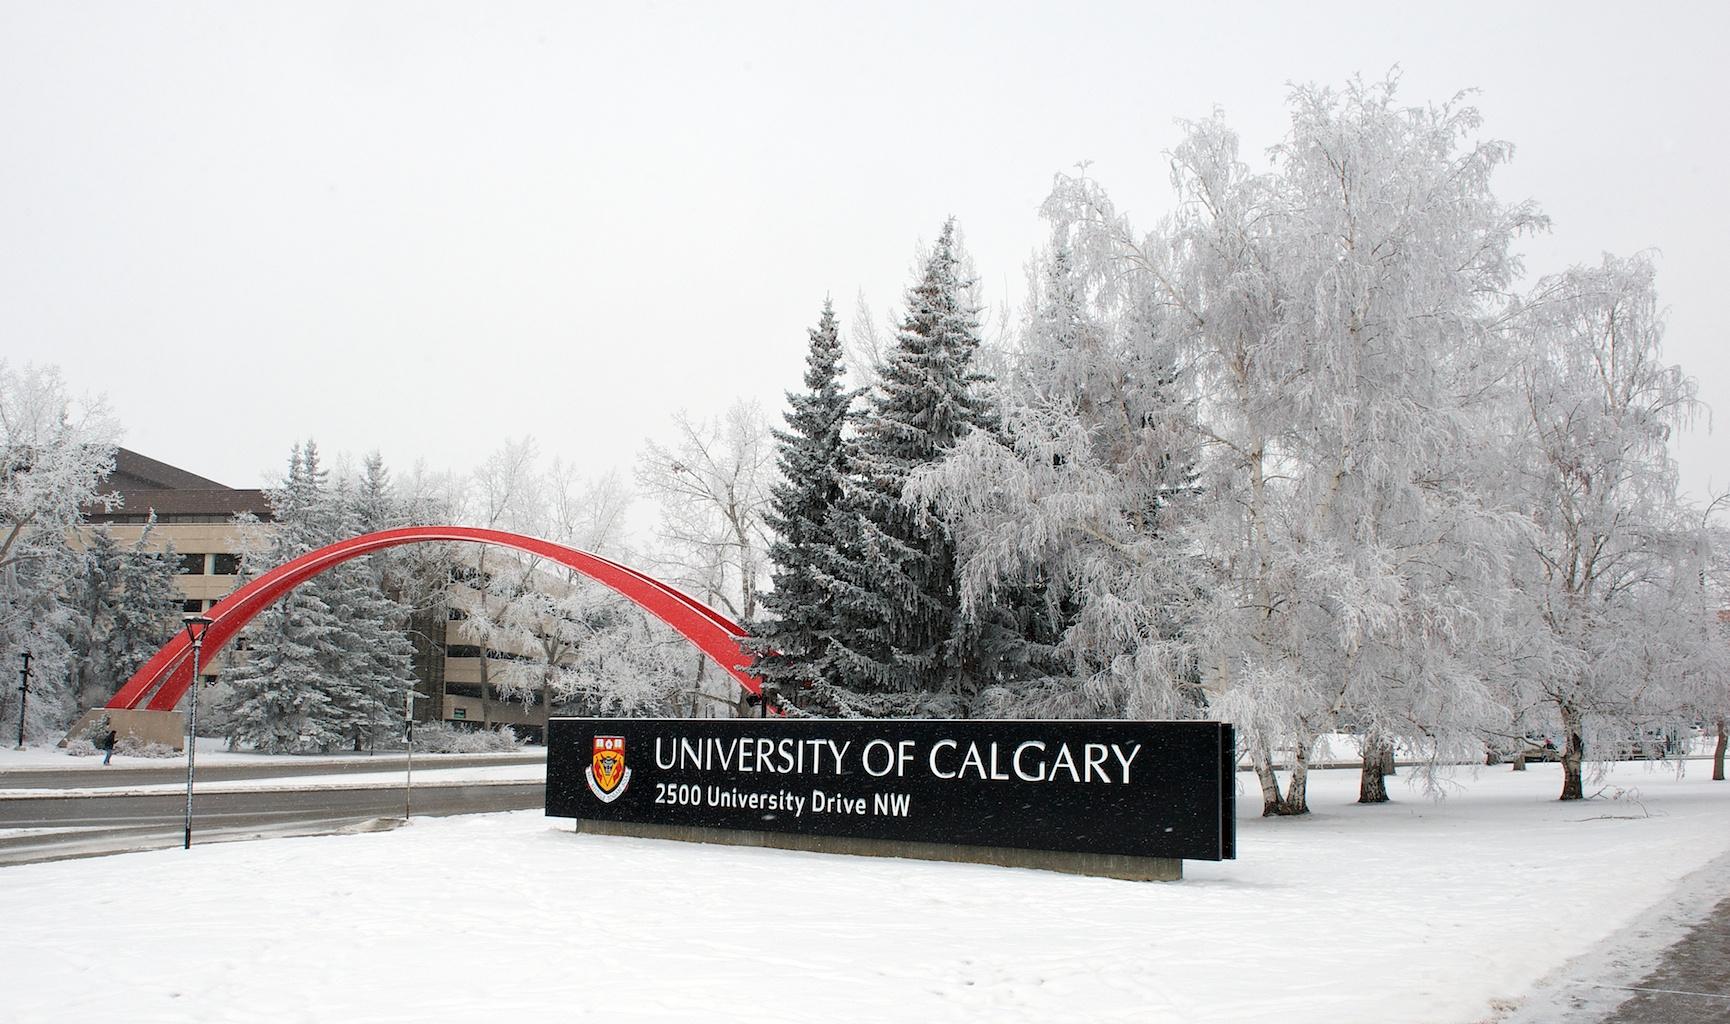 University of calgary strategy